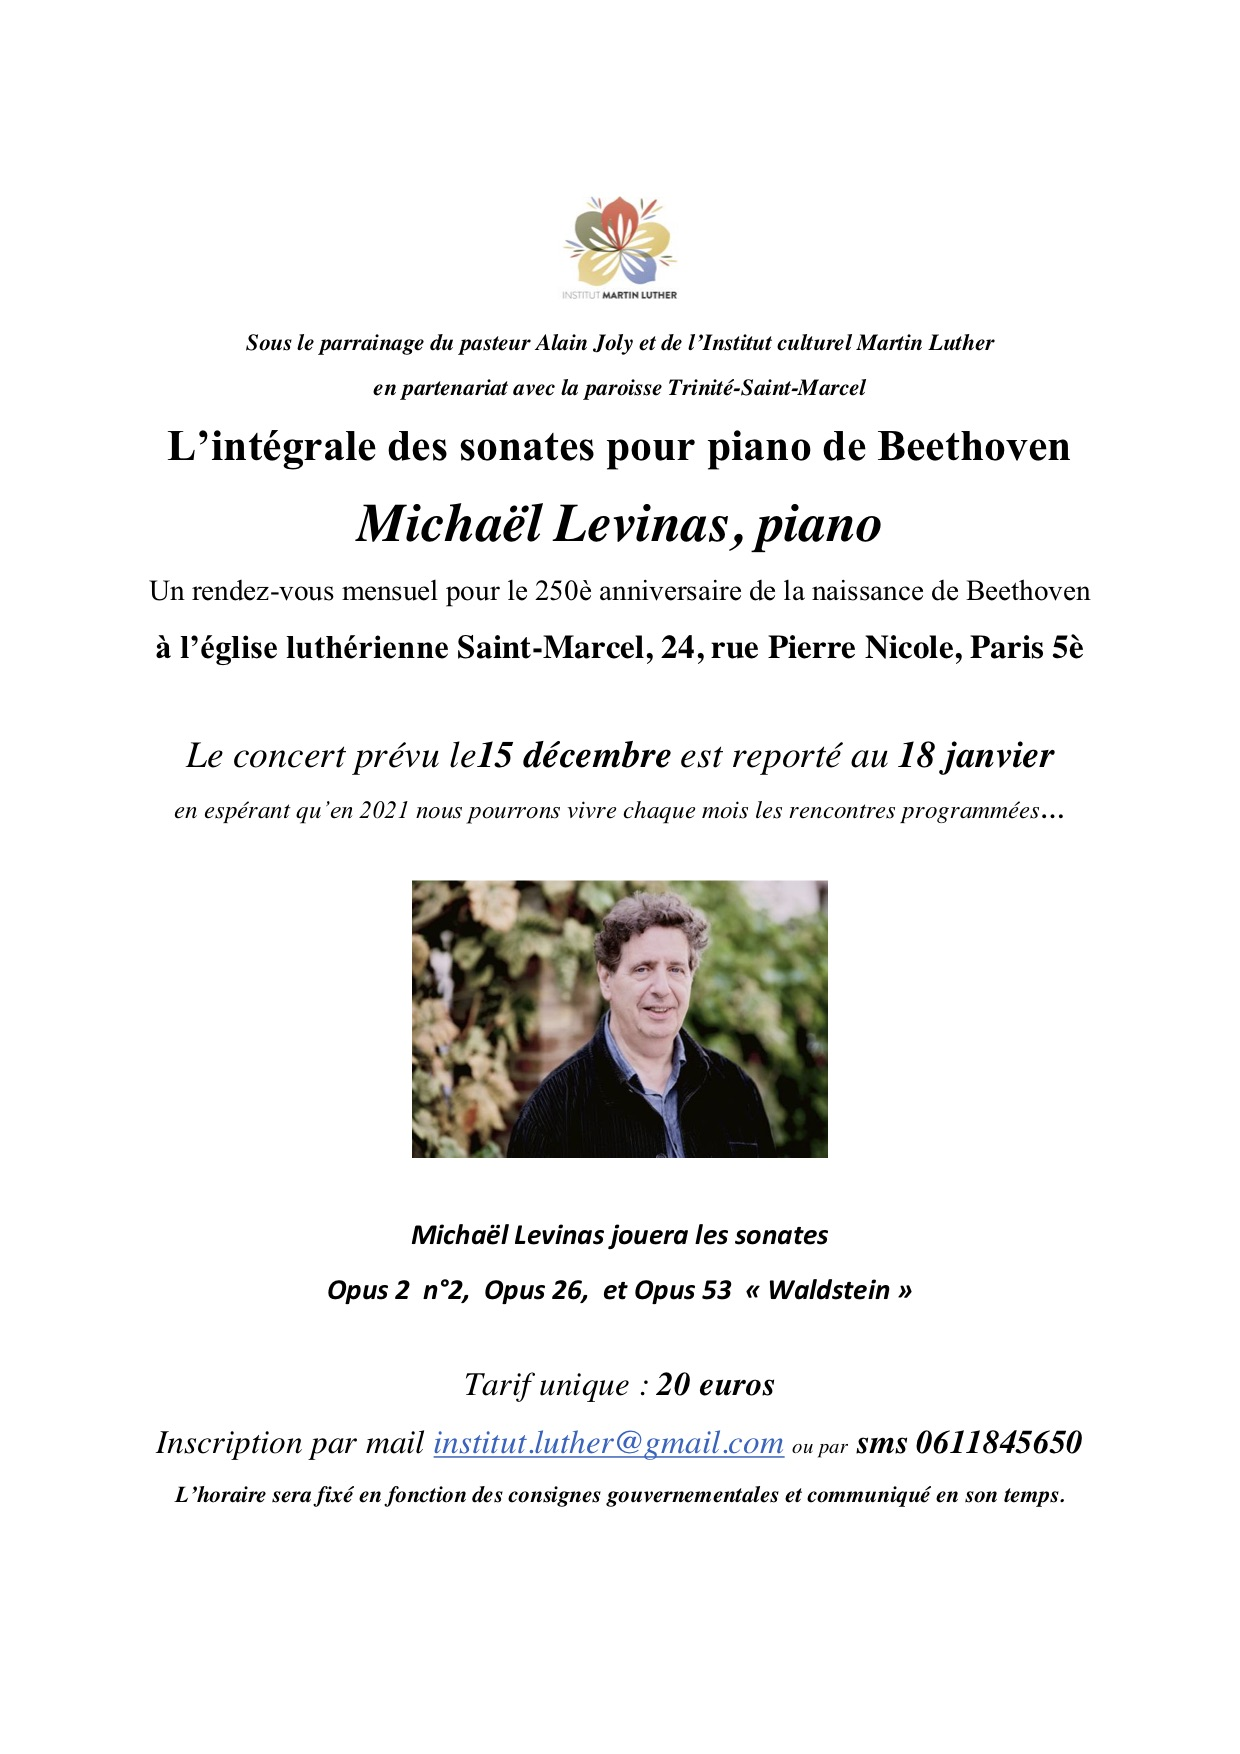 Beethoven - Levinas 18 janvier 2021